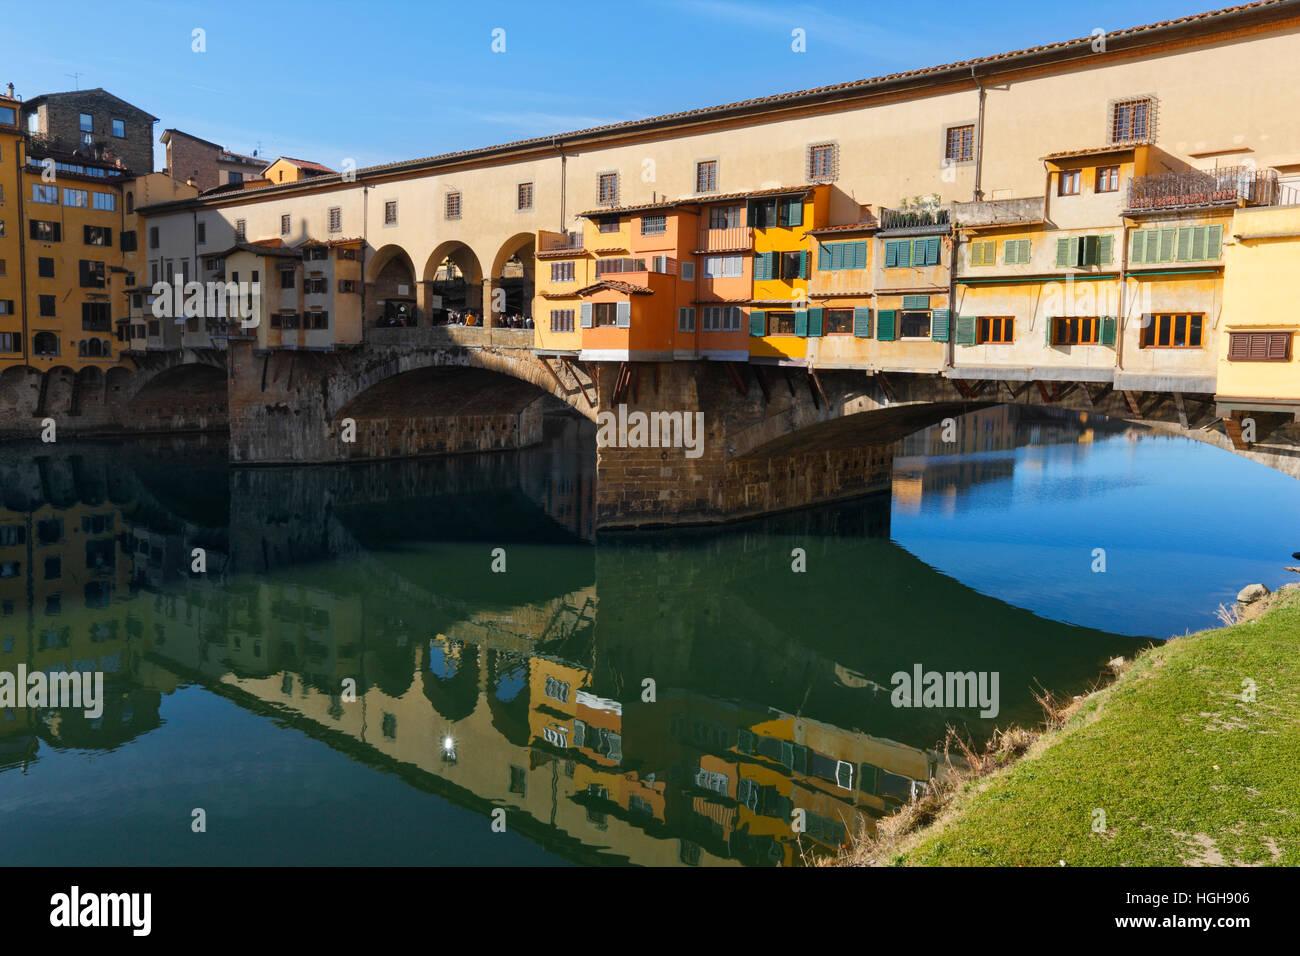 Florenz-Ponte Veccio in der Toskana Stockbild